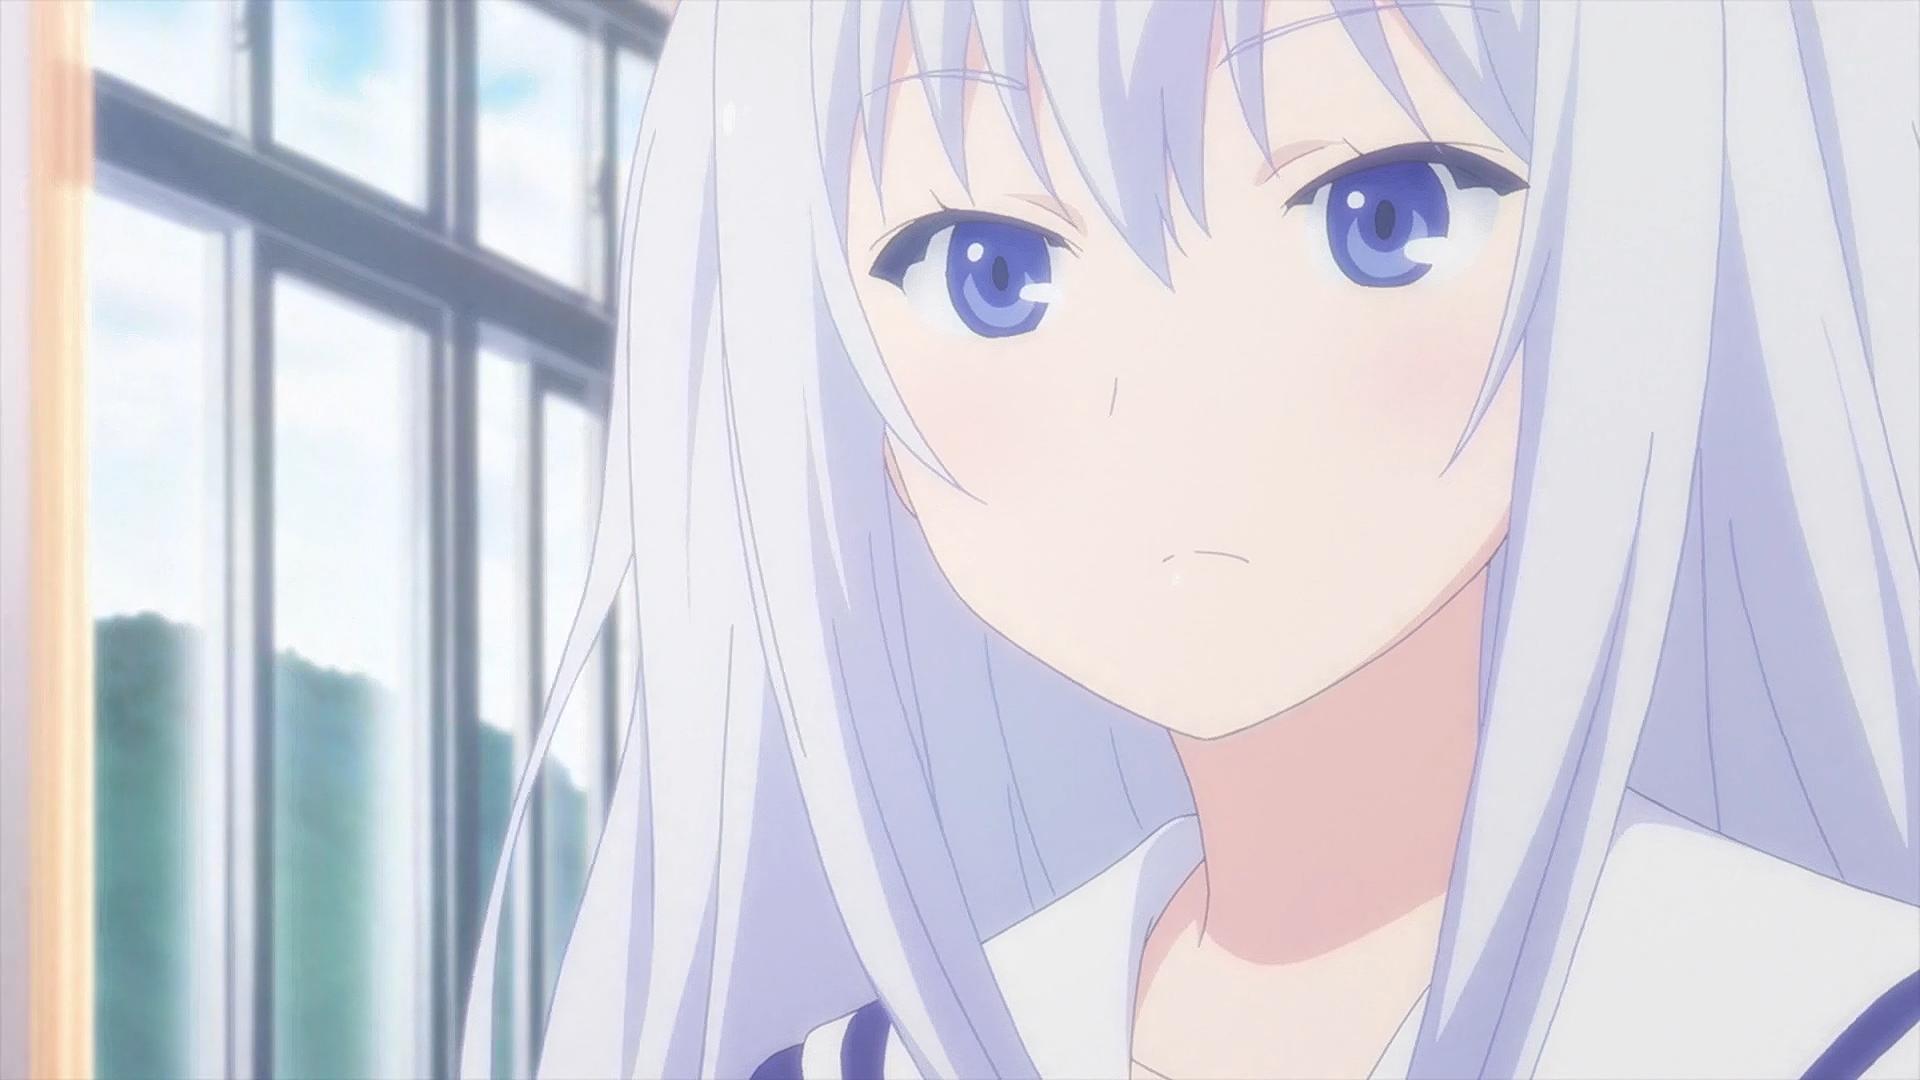 Natsukawa. Not sure if she likes Kidou or not... Anime: Ore no Kanojo to Osananajimi ga Shuraba Sugiru ( shortened to: OreShura) Not asking for thumbs, just wan Natsukawa Not sure if she likes Kidou or not Anime: Ore no Kanojo to Osananajimi ga Shuraba Sugiru ( shortened to: OreShura) asking for thumbs just wan